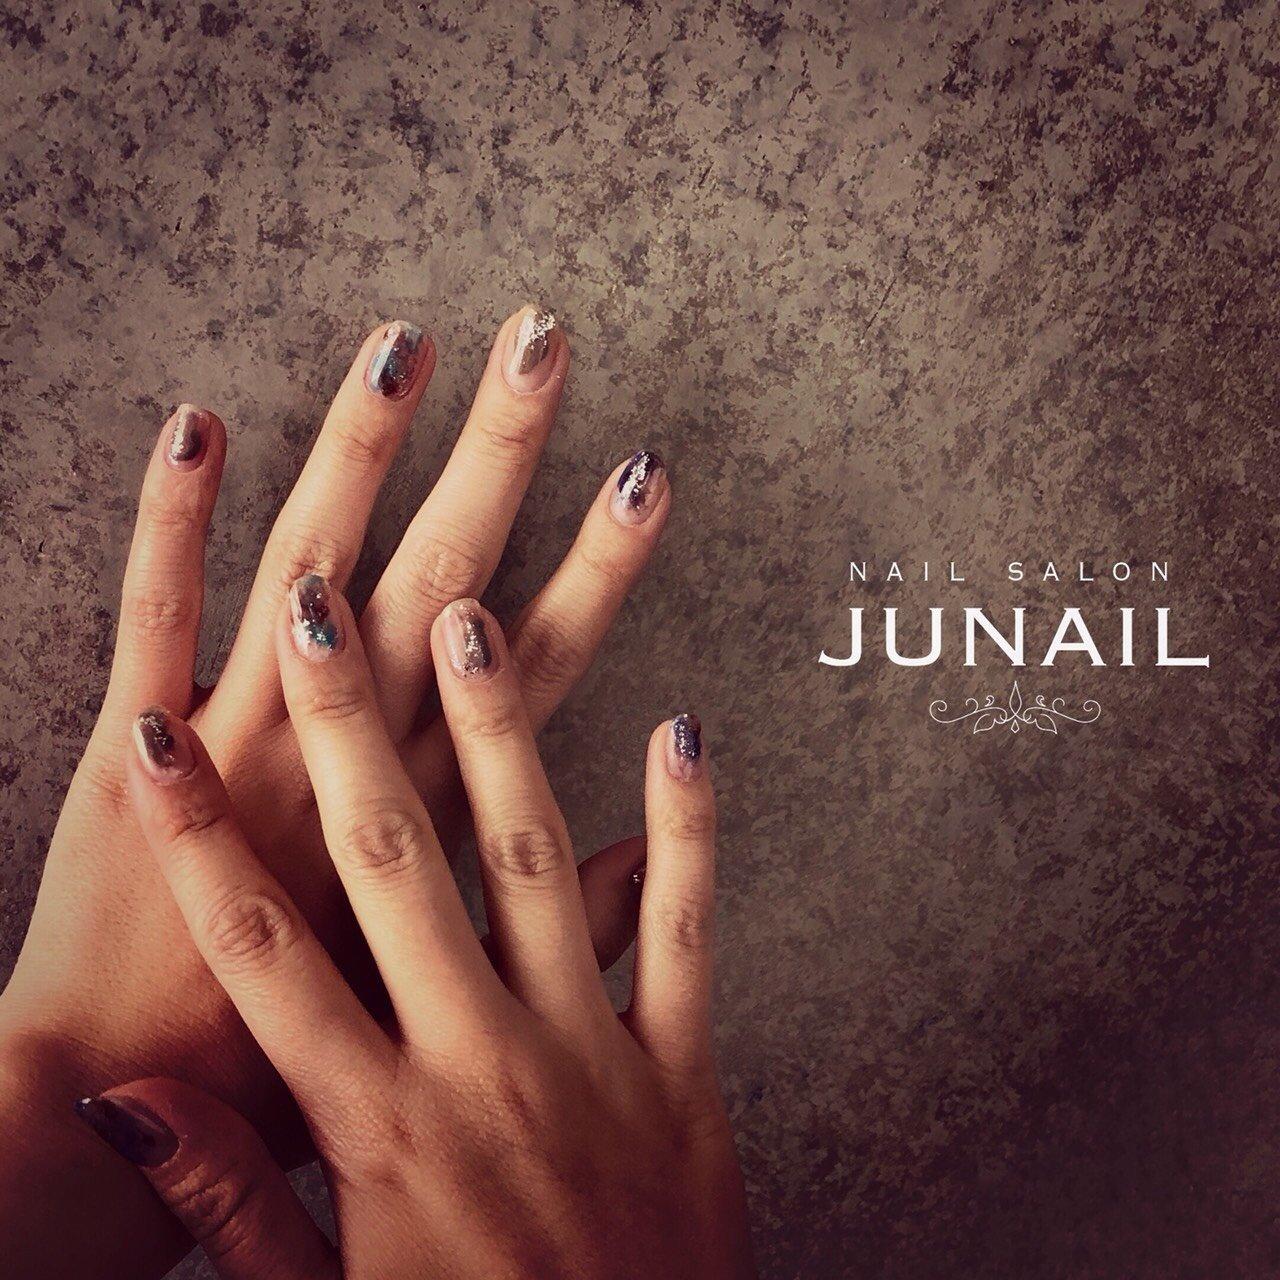 instagram→junail.jun ホットペッパービューティー掲載中☆ #june #ネイルブック